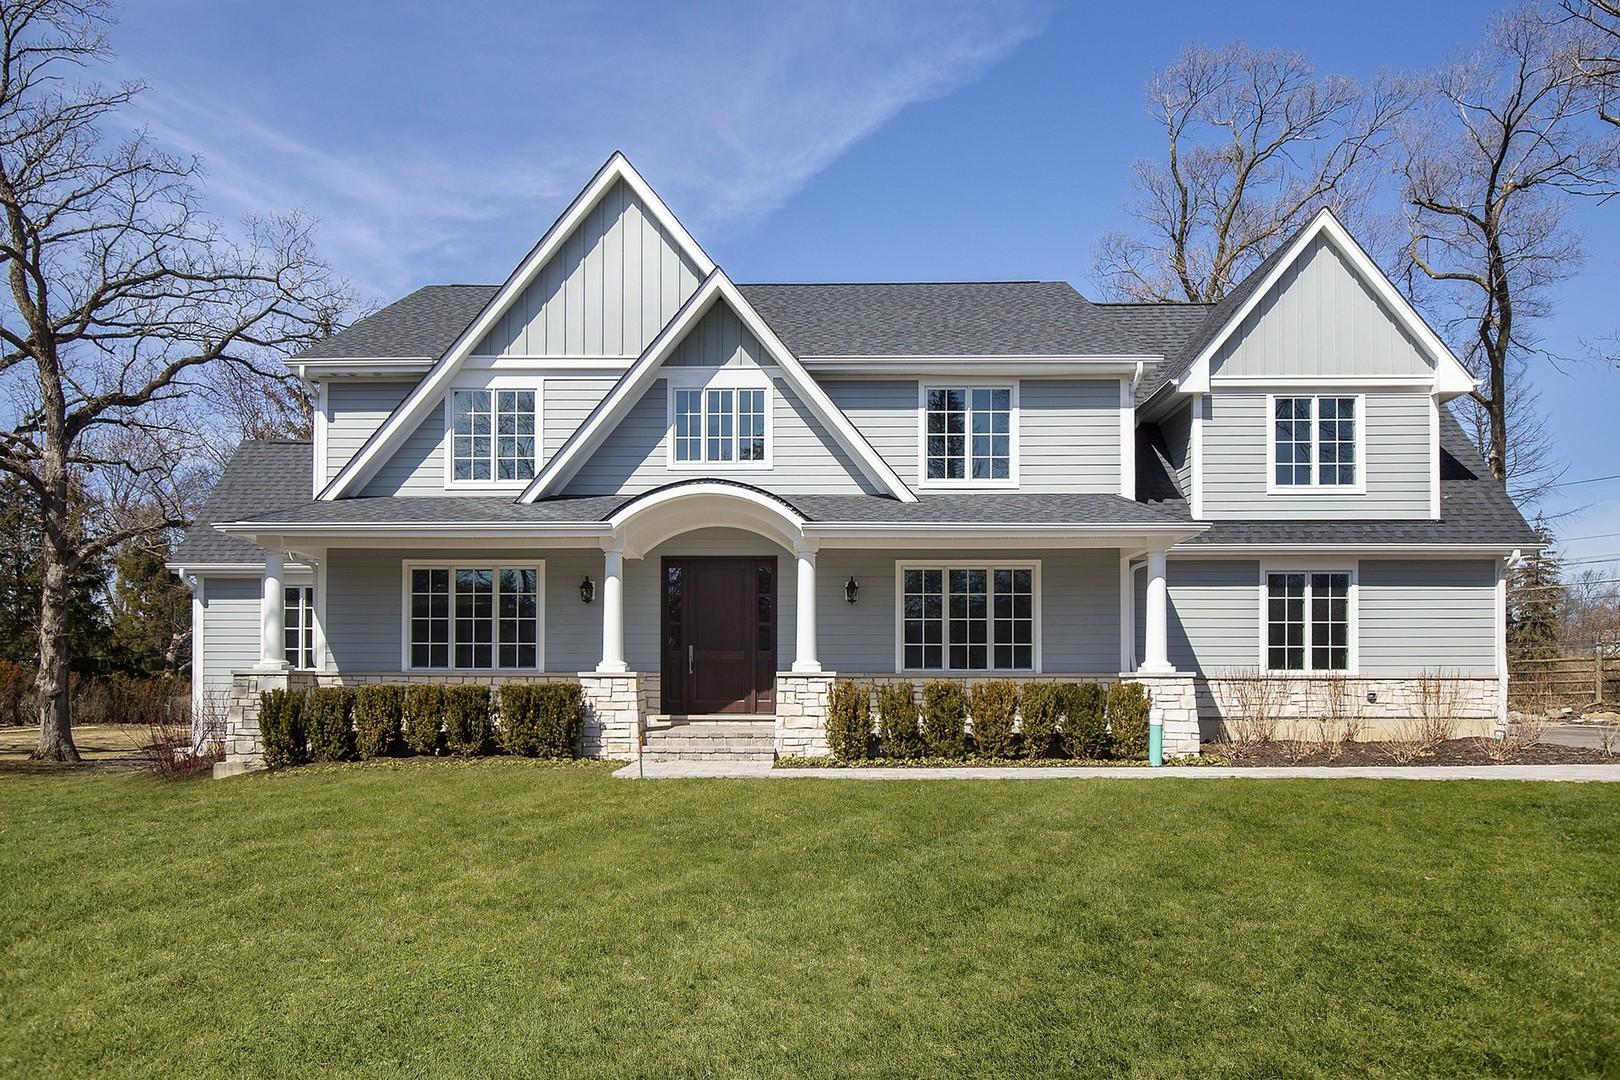 1436 Kenilworth, Glenview, Illinois, 60025